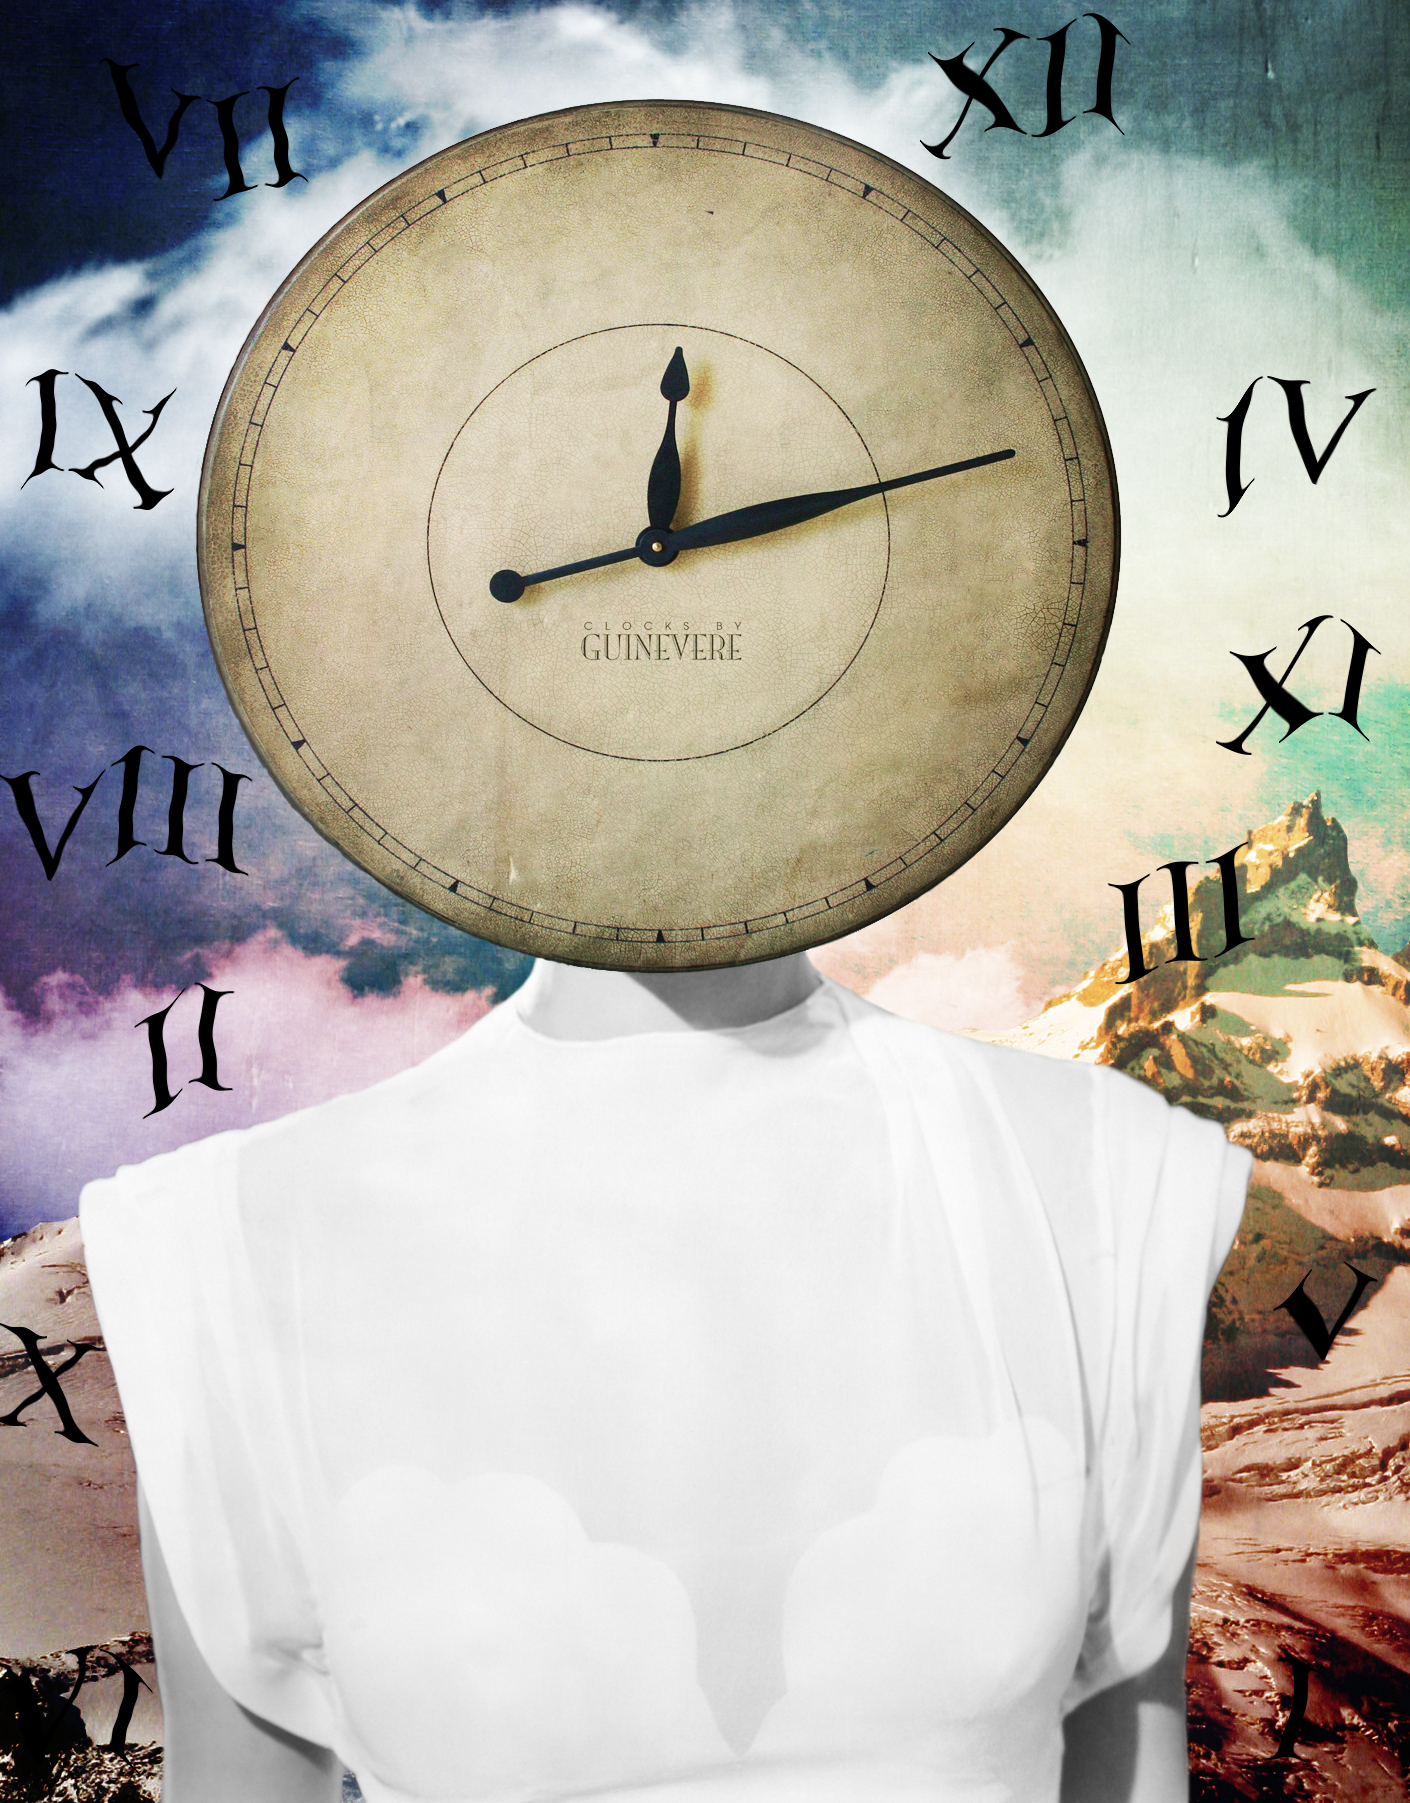 Jenkins, Cheyenne. Ticking Clock. 2015. Digital Collage. Montreal, Quebec